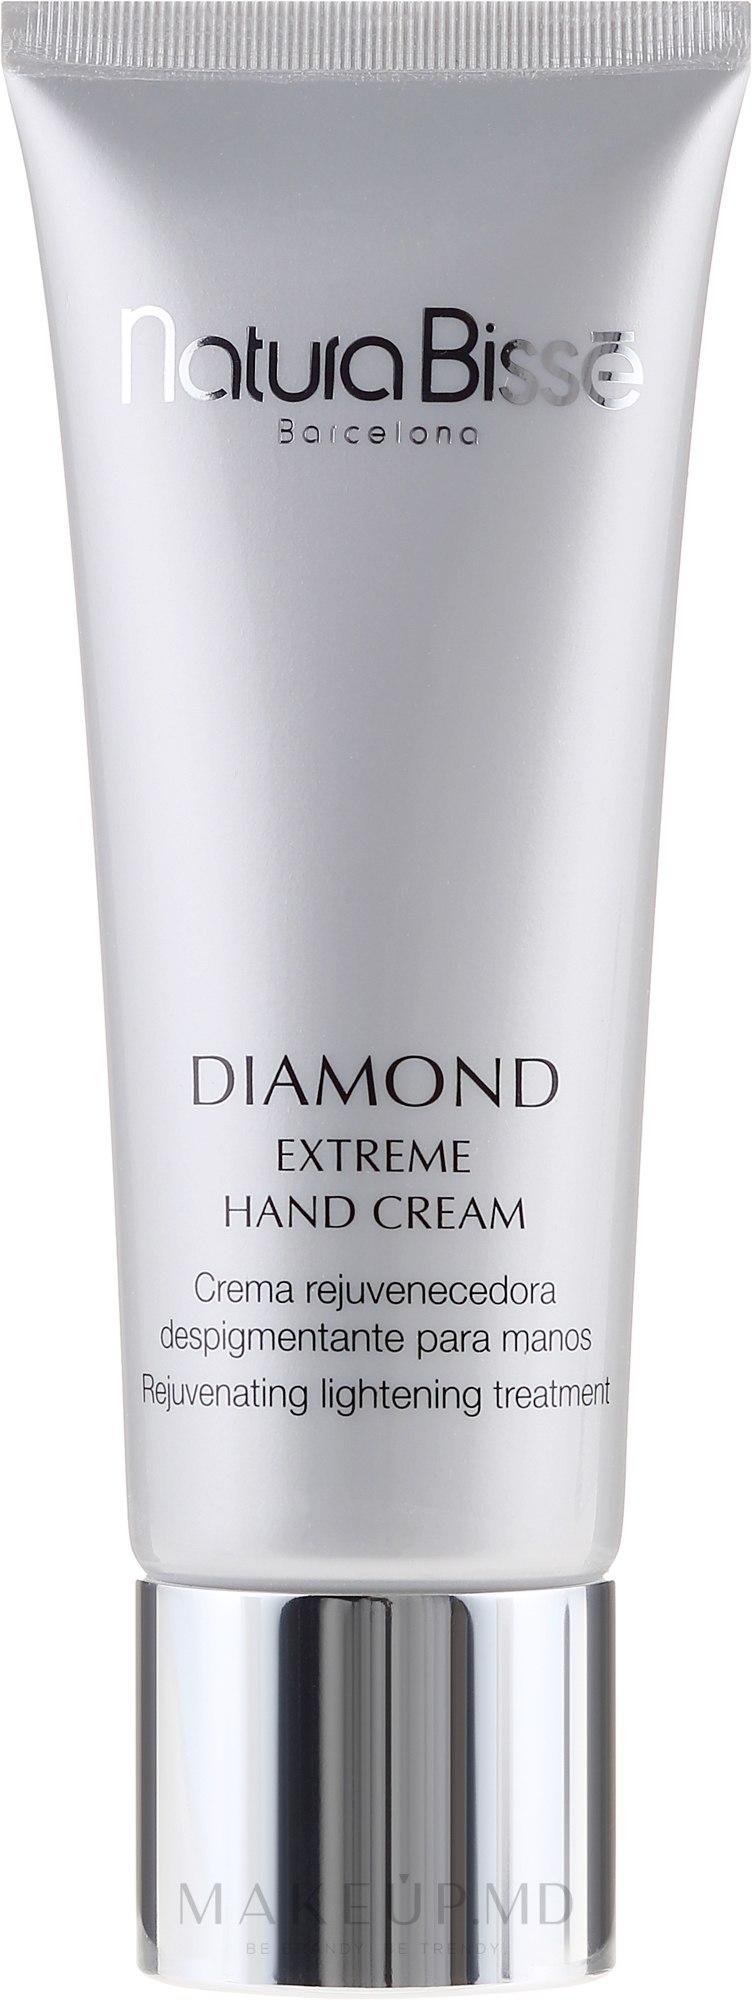 Cremă de mâini - Natura Bisse Diamond Extreme Hand Cream — Imagine 75 ml